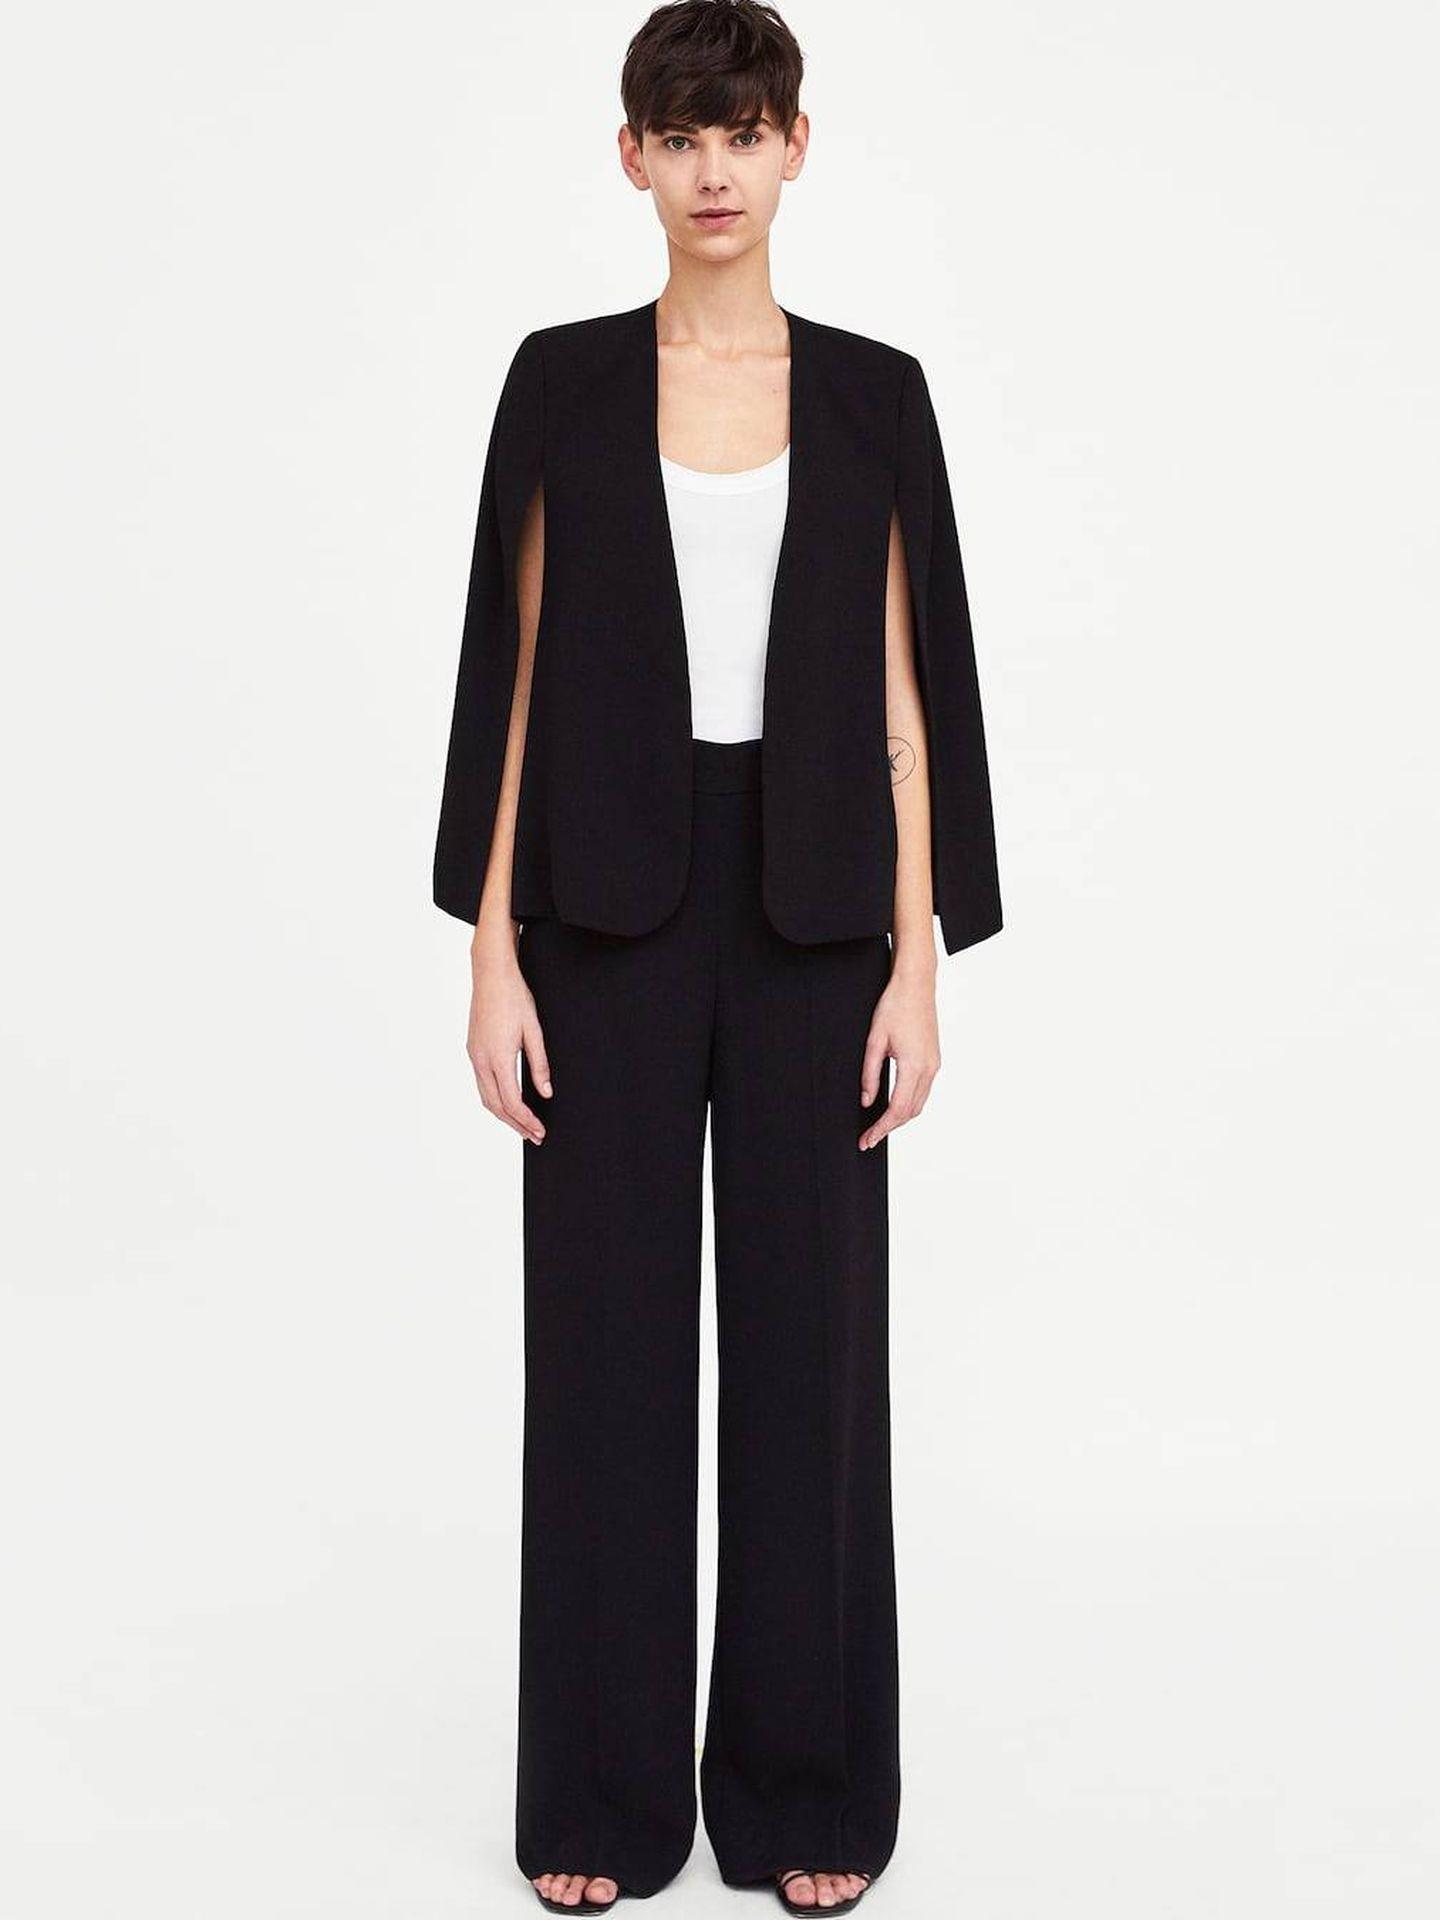 Blazer (49,95 €) y pantalón (39,95 €), todo de Zara.